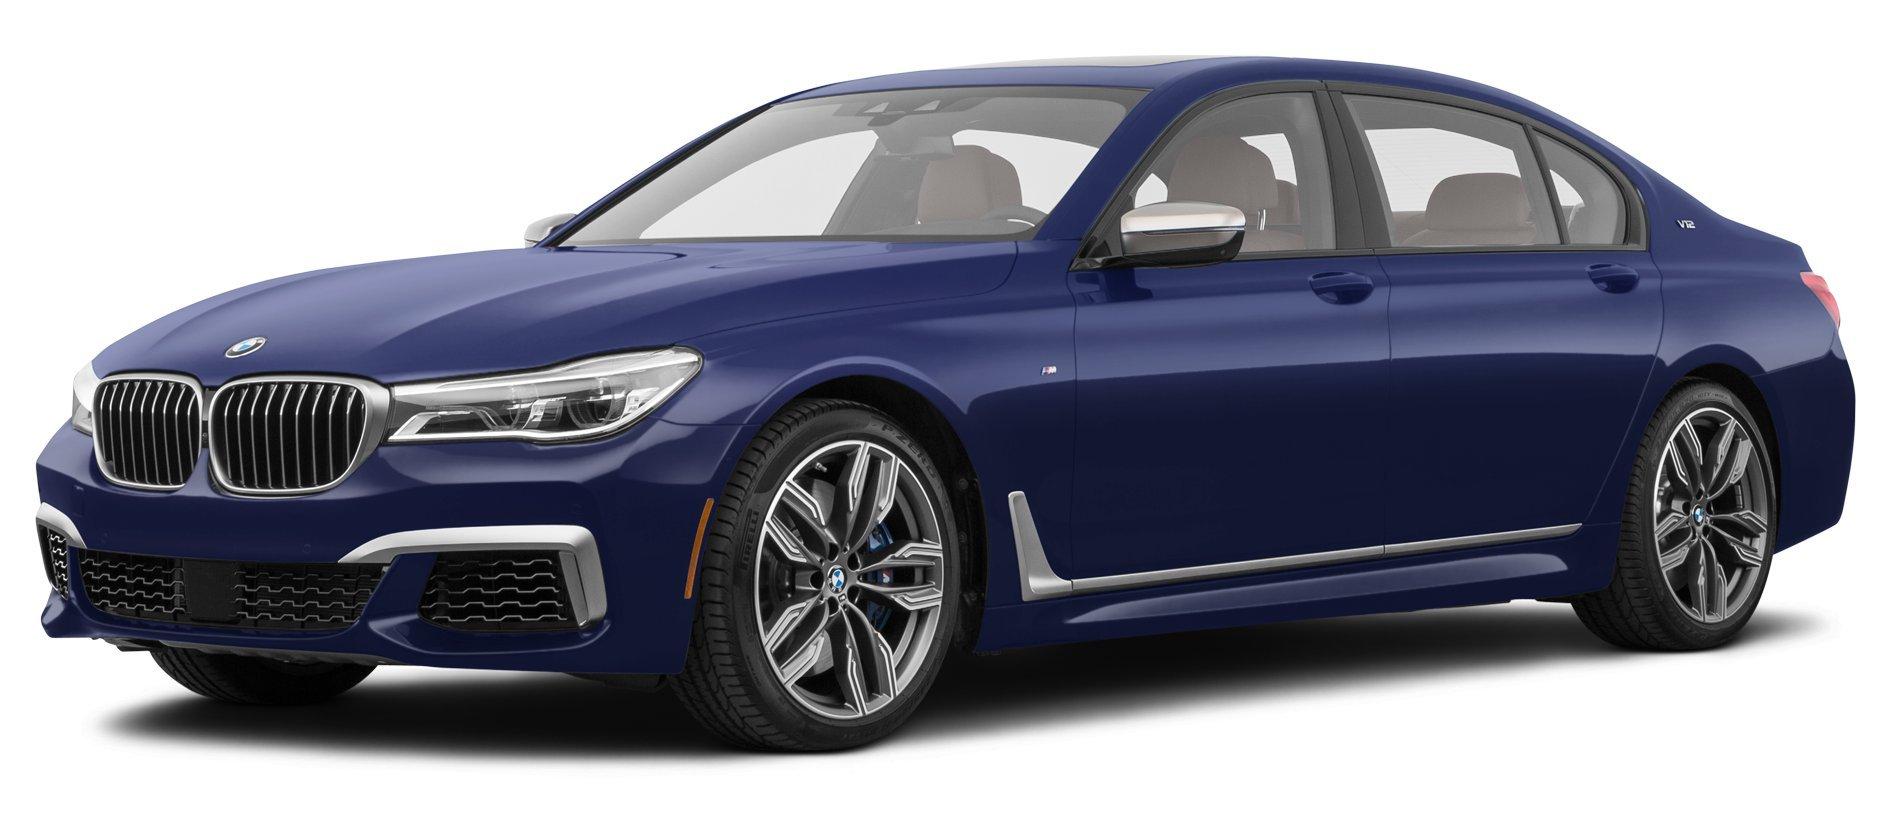 Amazoncom BMW Alpina B Reviews Images And Specs Vehicles - 2018 bmw b7 alpina